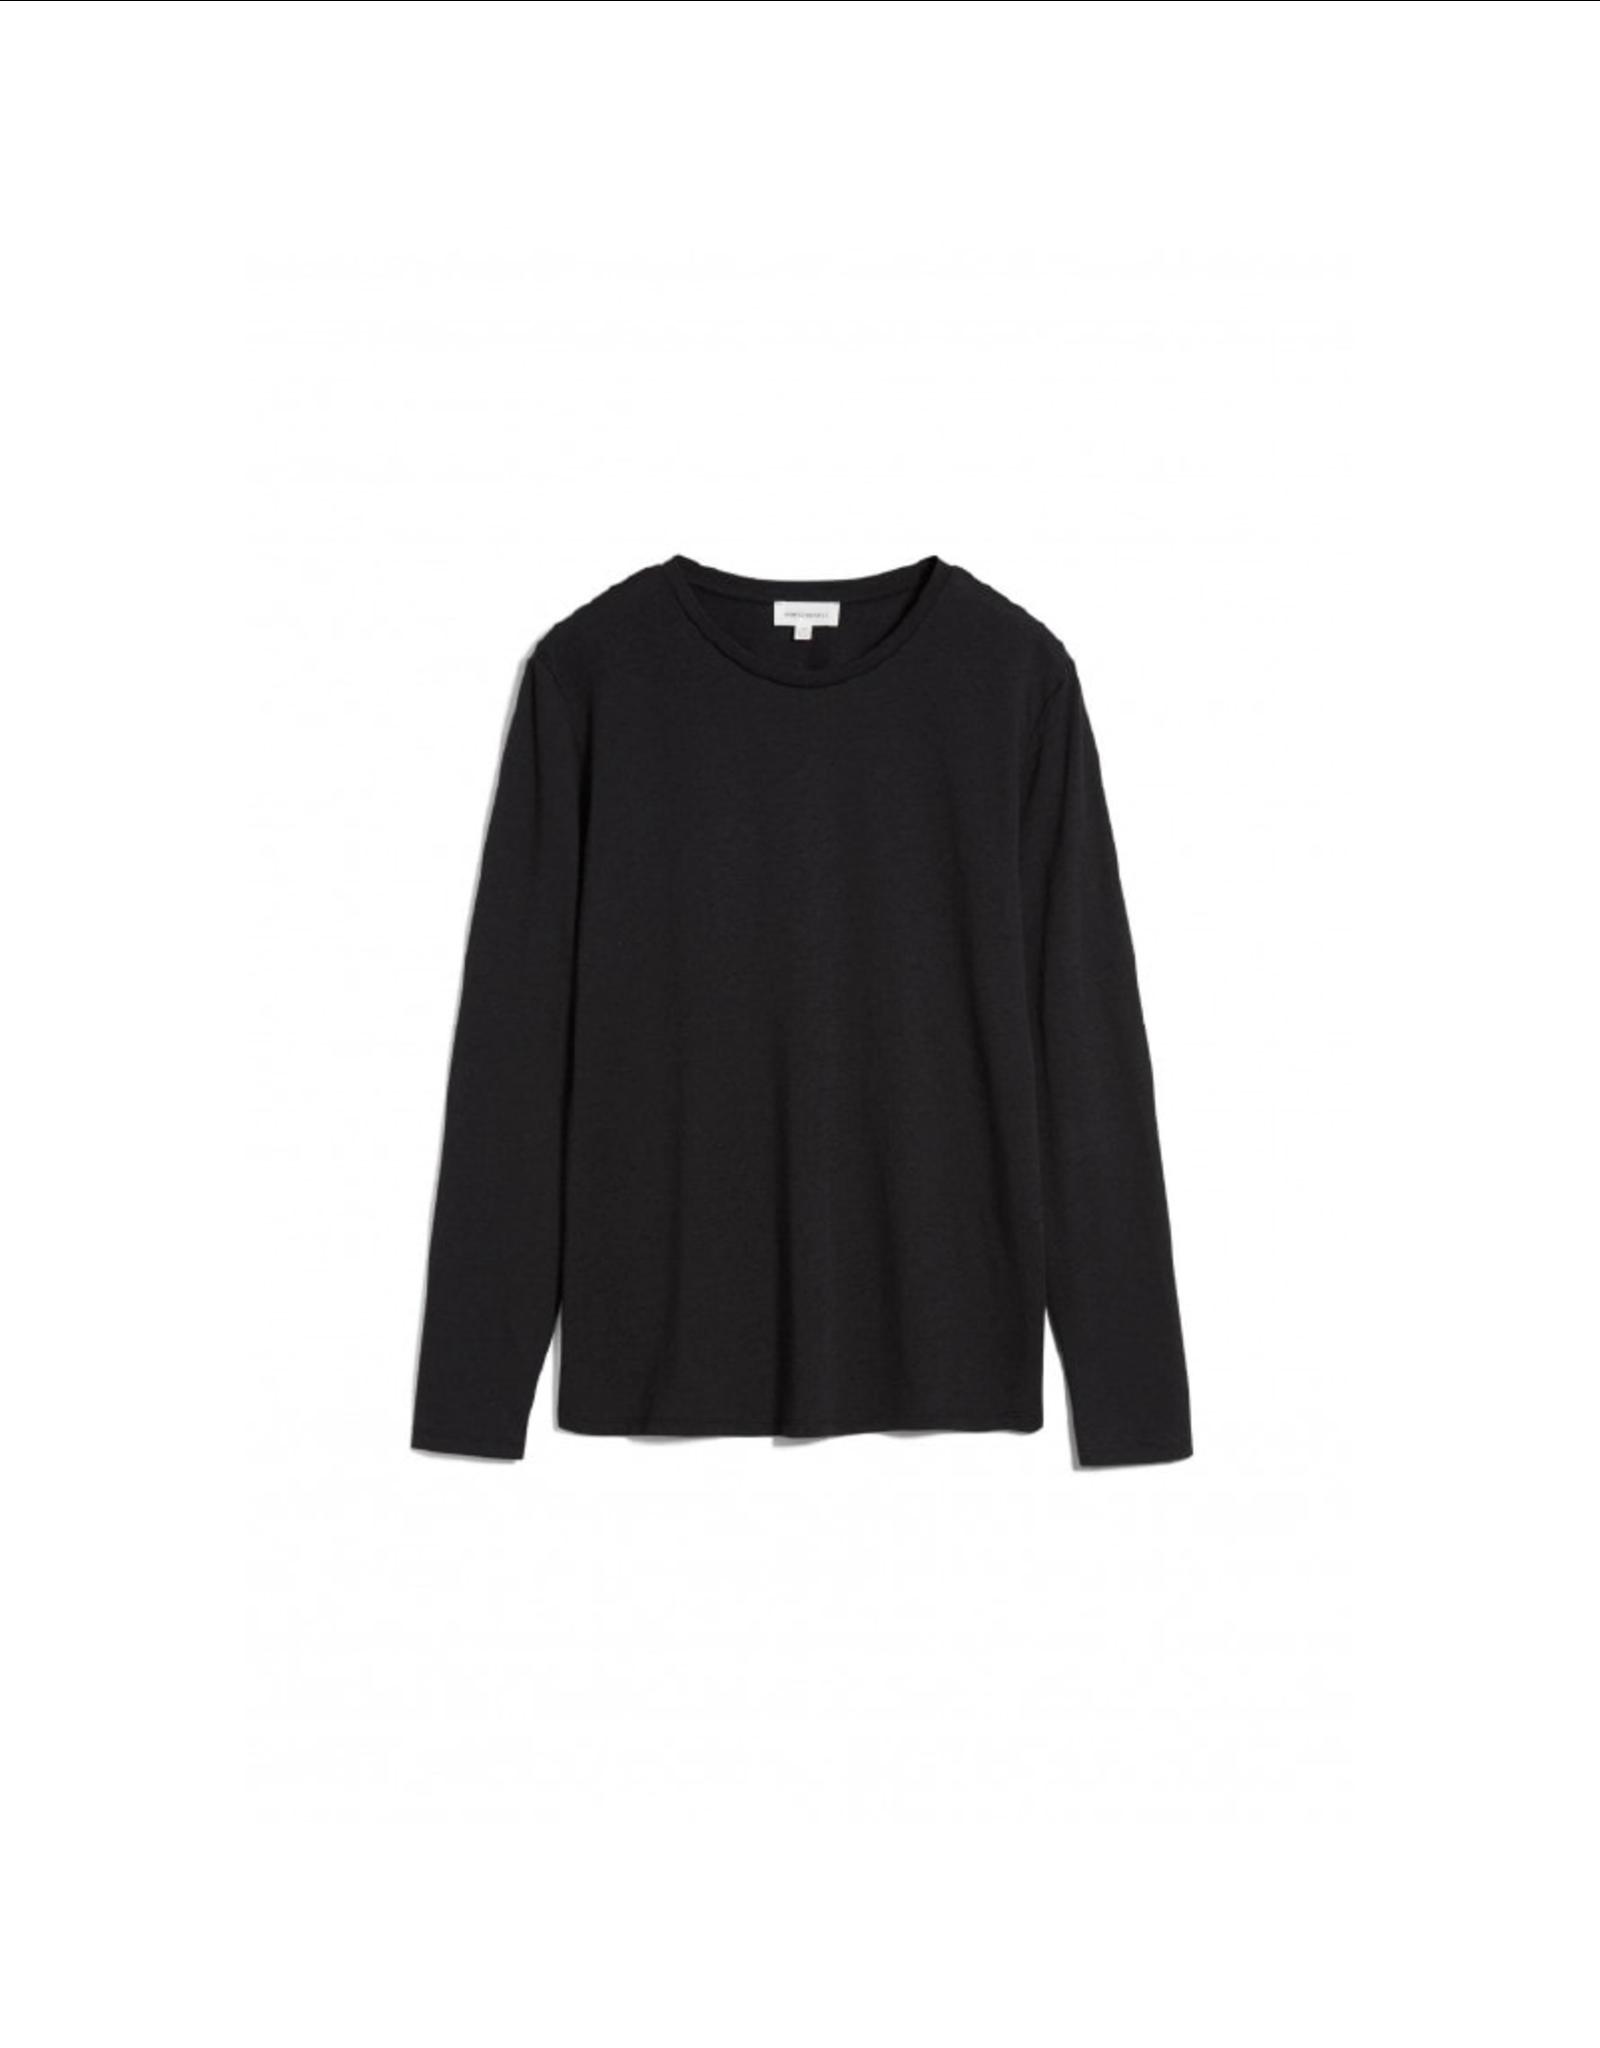 Armedangels Koamaa Lyocell Cotton Long-Sleeve Shirt